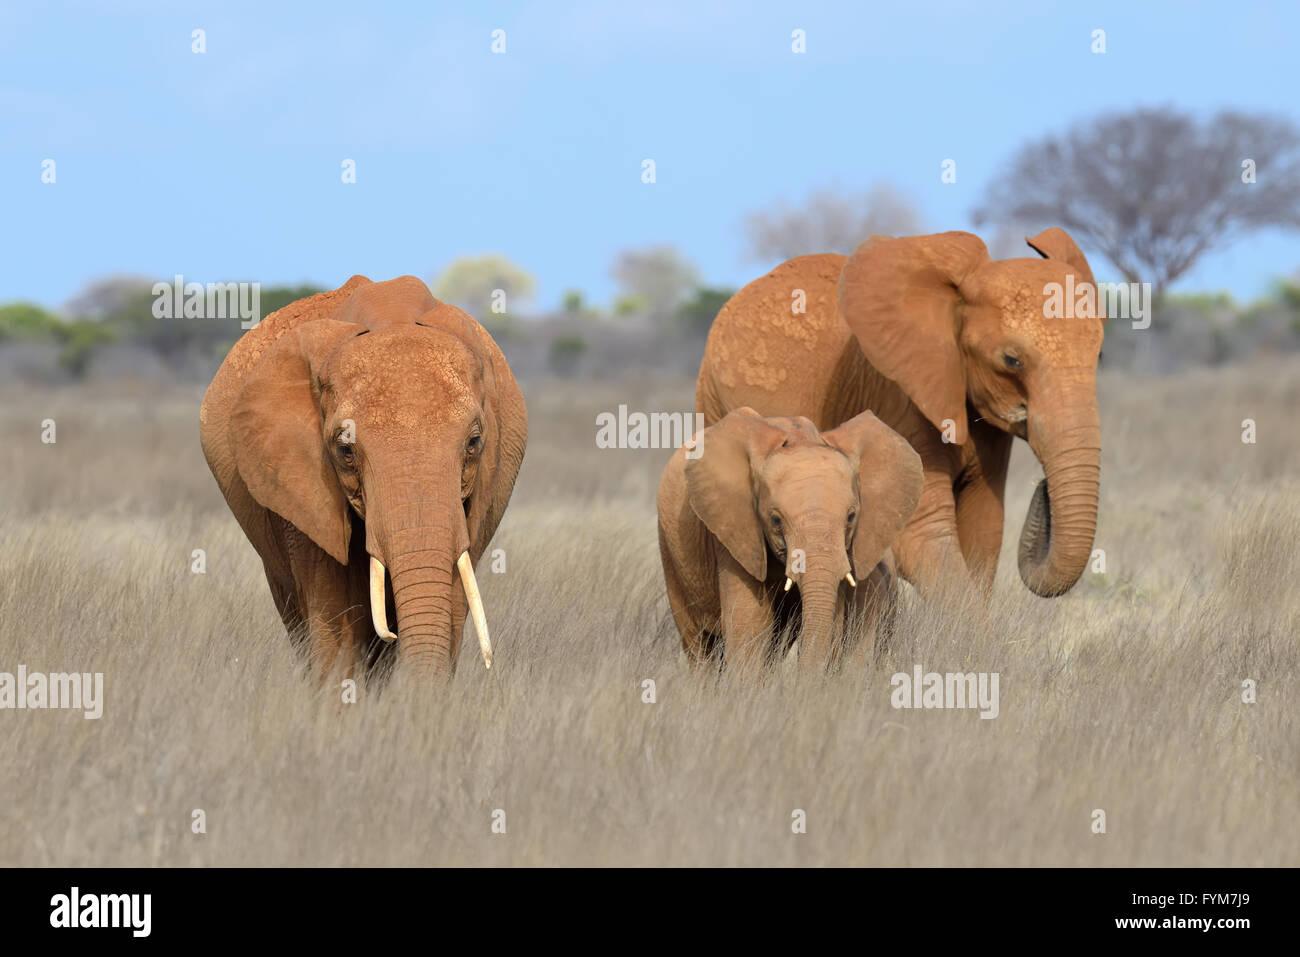 Elephant in National park of Kenya, Africa - Stock Image